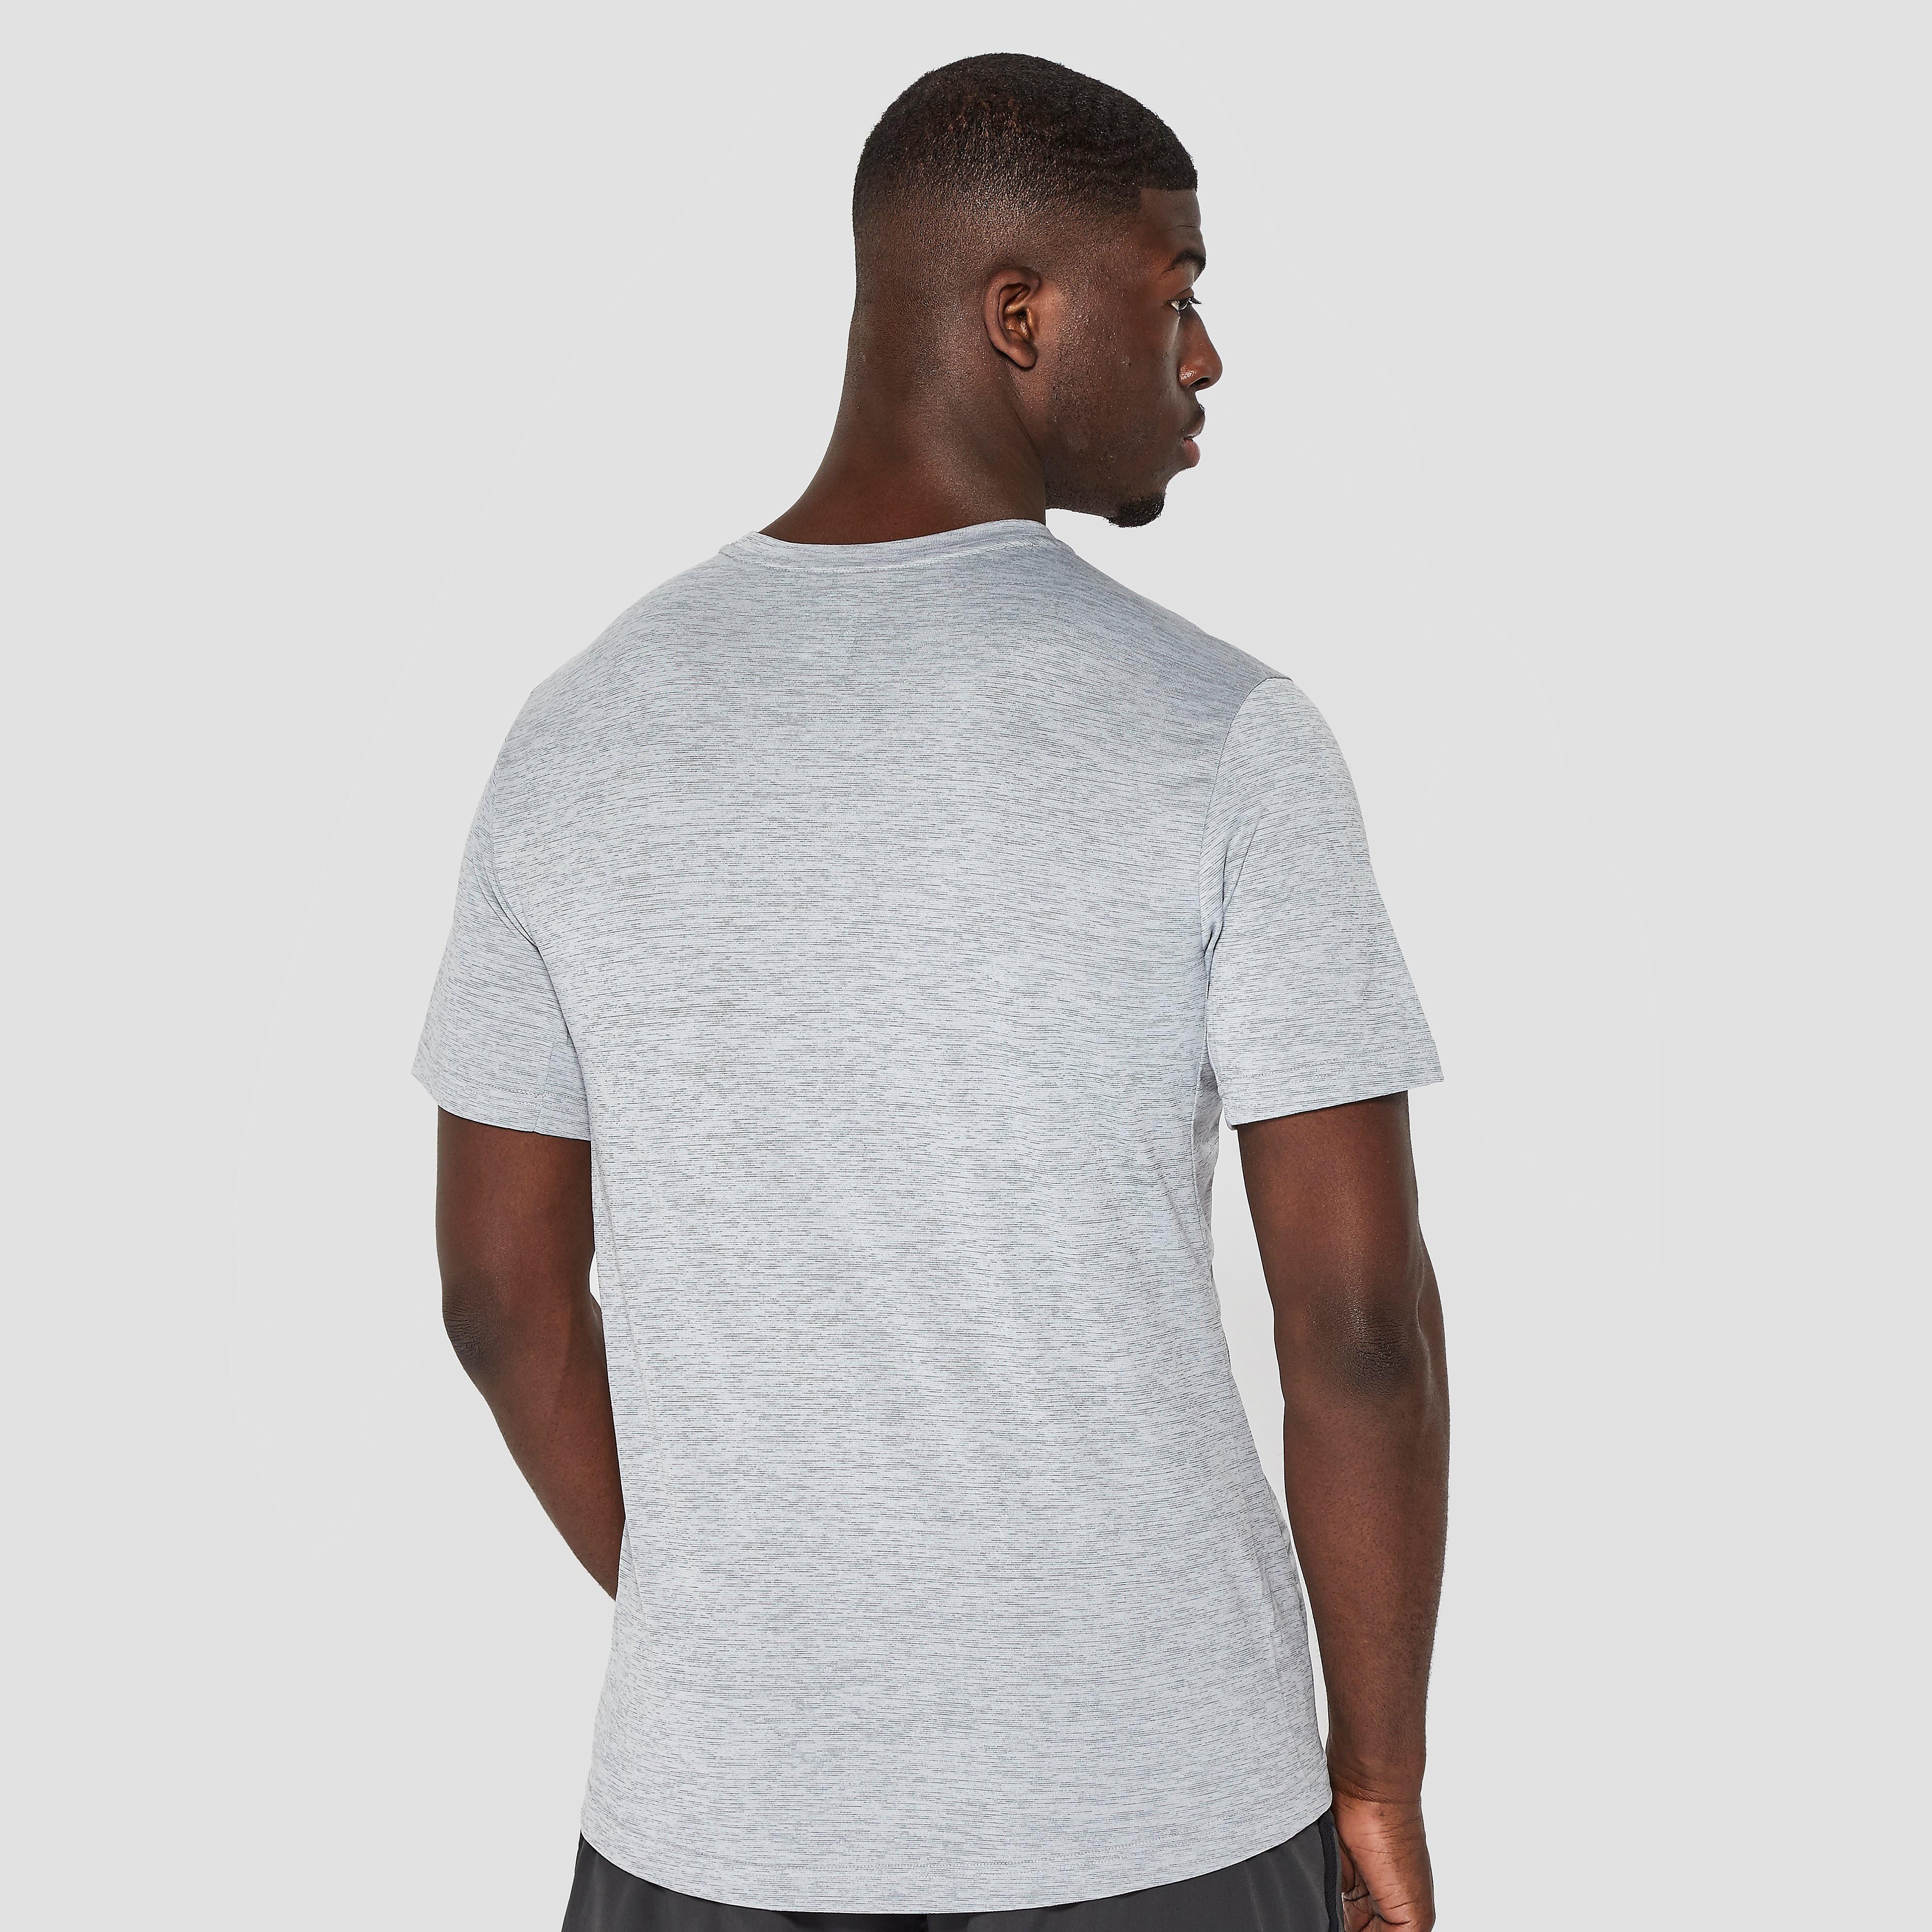 Nike Men's Dry Contour Short-Sleeve Running Top